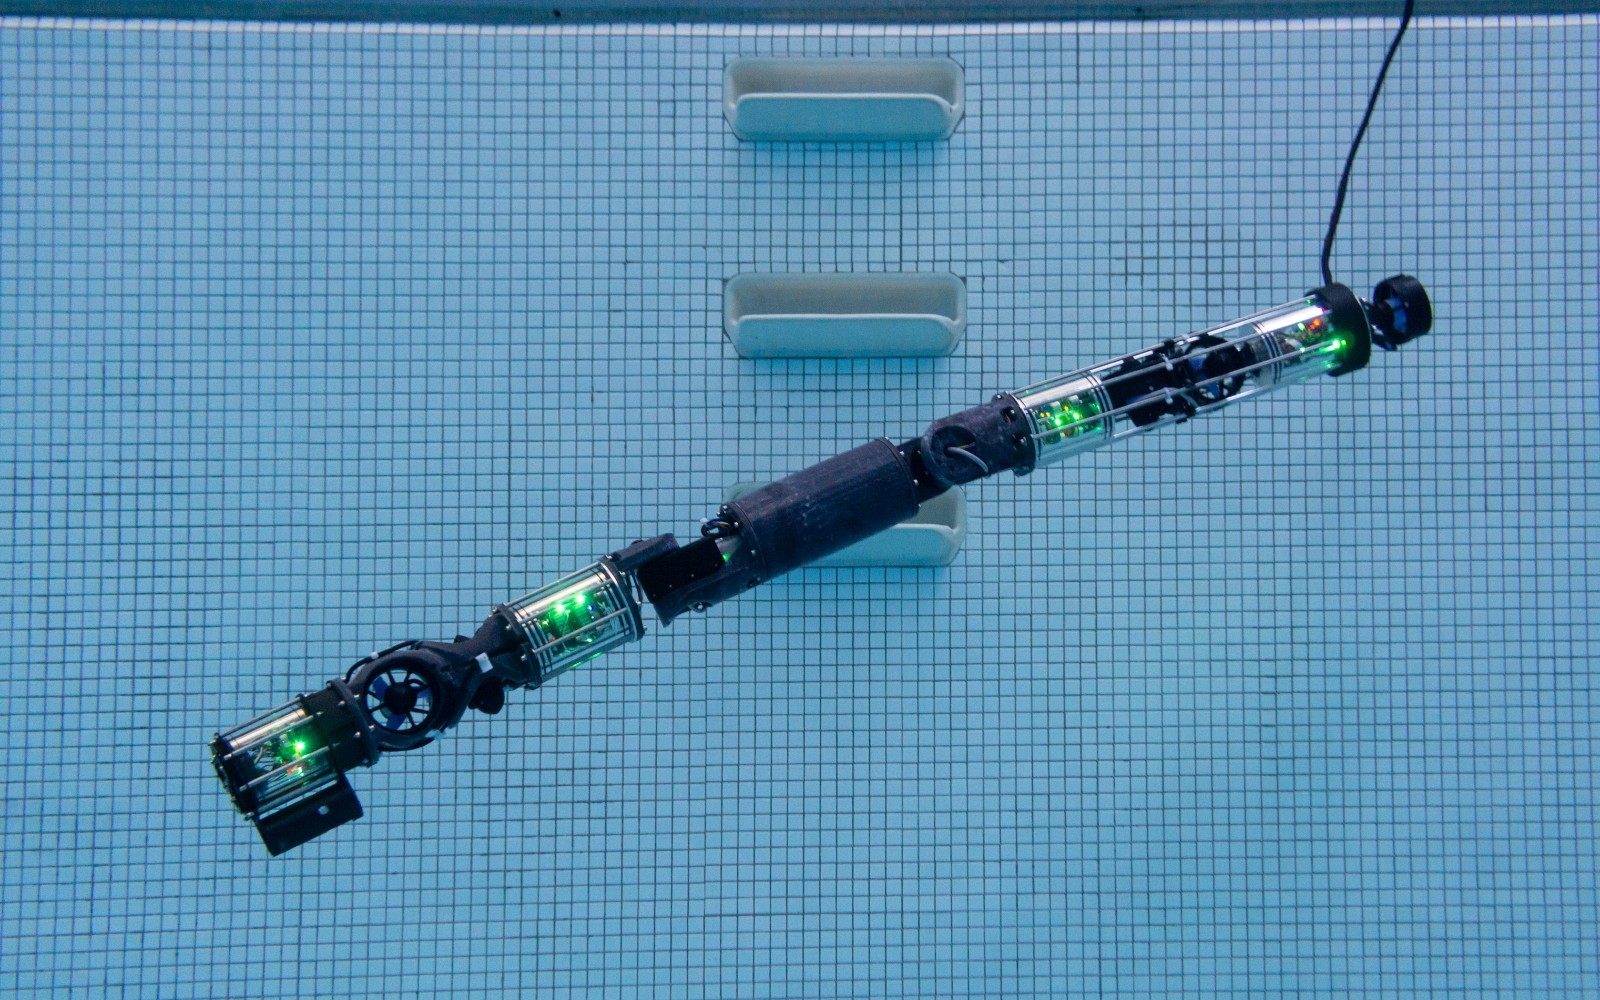 Carnegie Mellon's latest snakebot can swim underwater